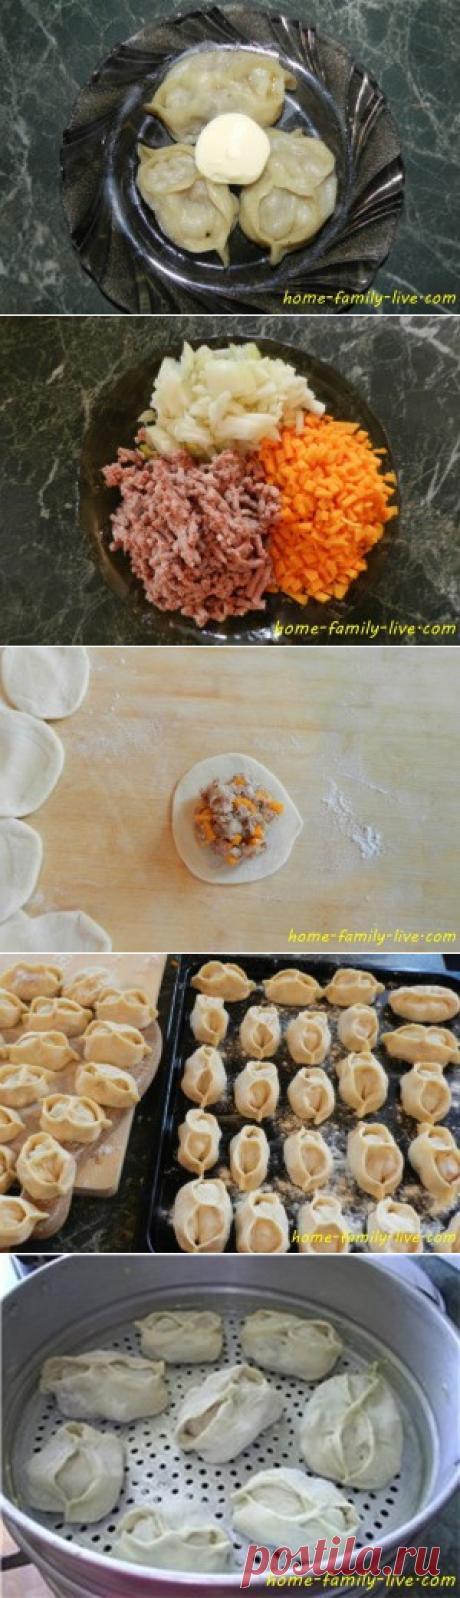 Манты - пошаговый рецепт с подробным фотоКулинарные рецепты